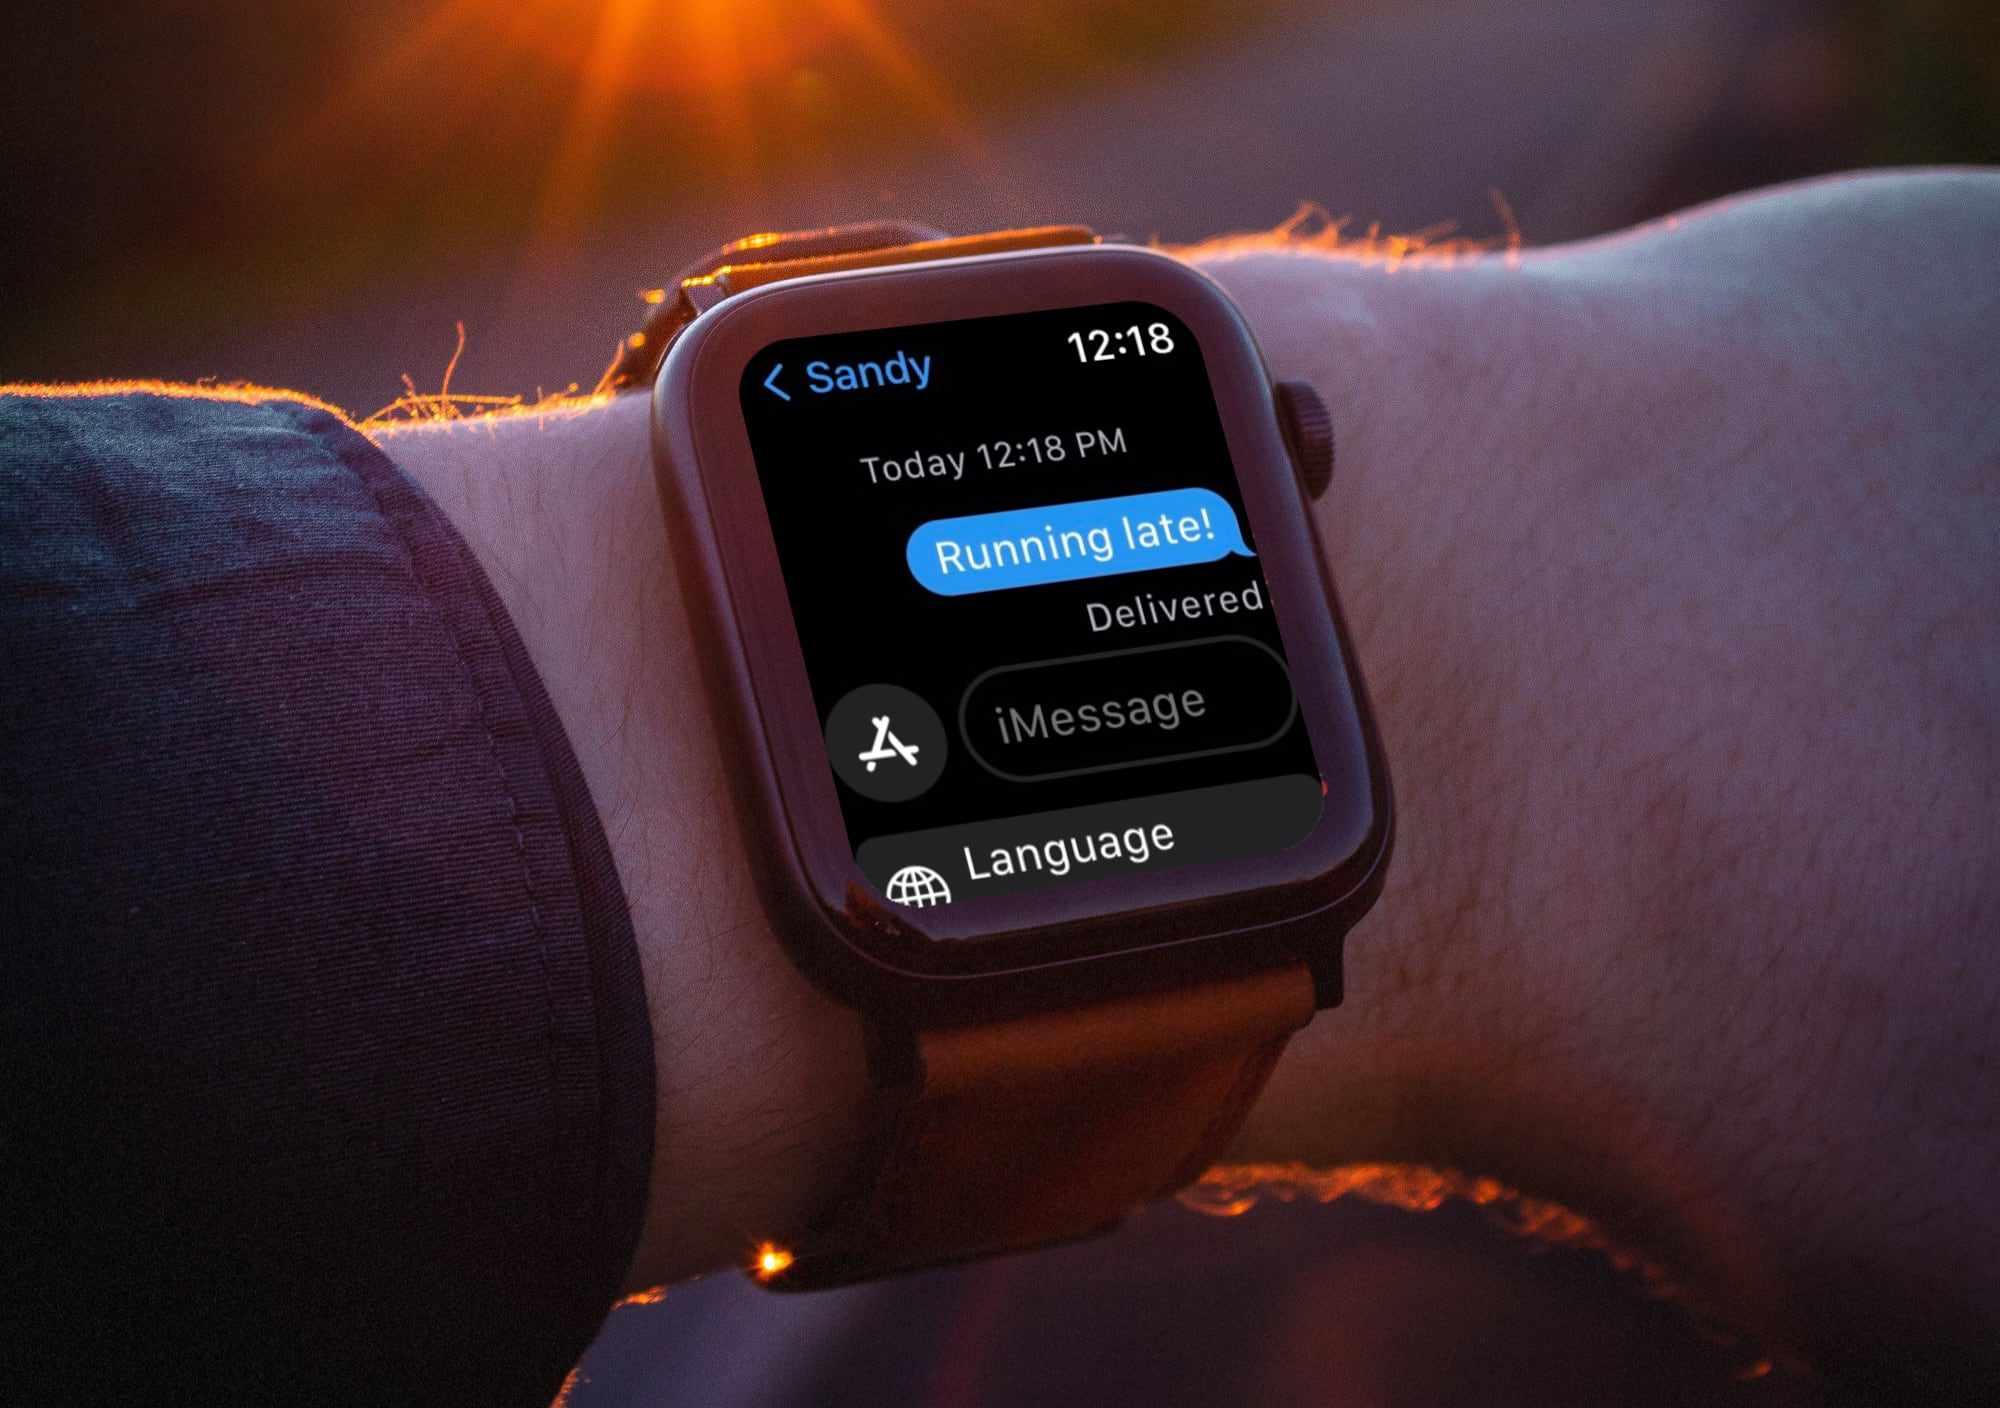 Use custom response on Apple Watch